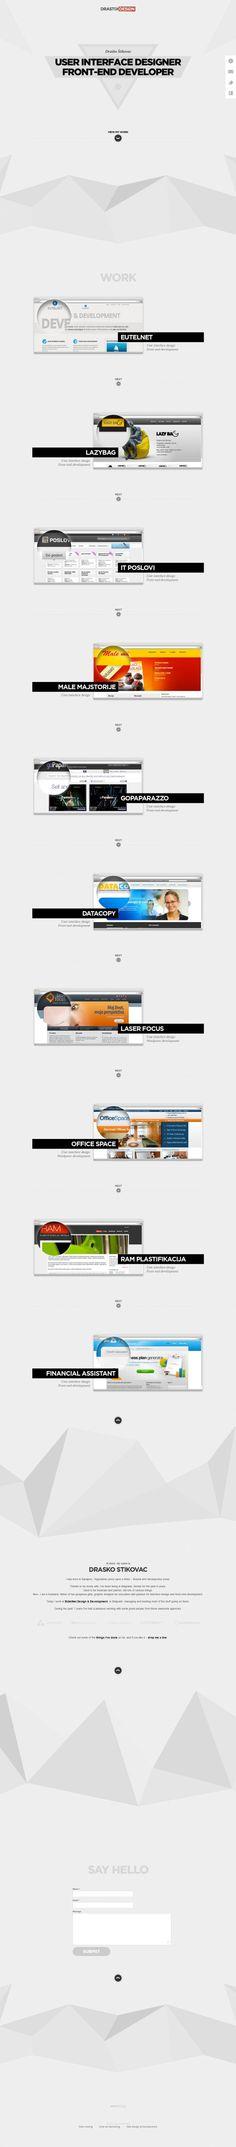 Web designer - Front-end developer - Drasko Stikovac - Best website, web design inspiration showcase - www.niceoneilike.com